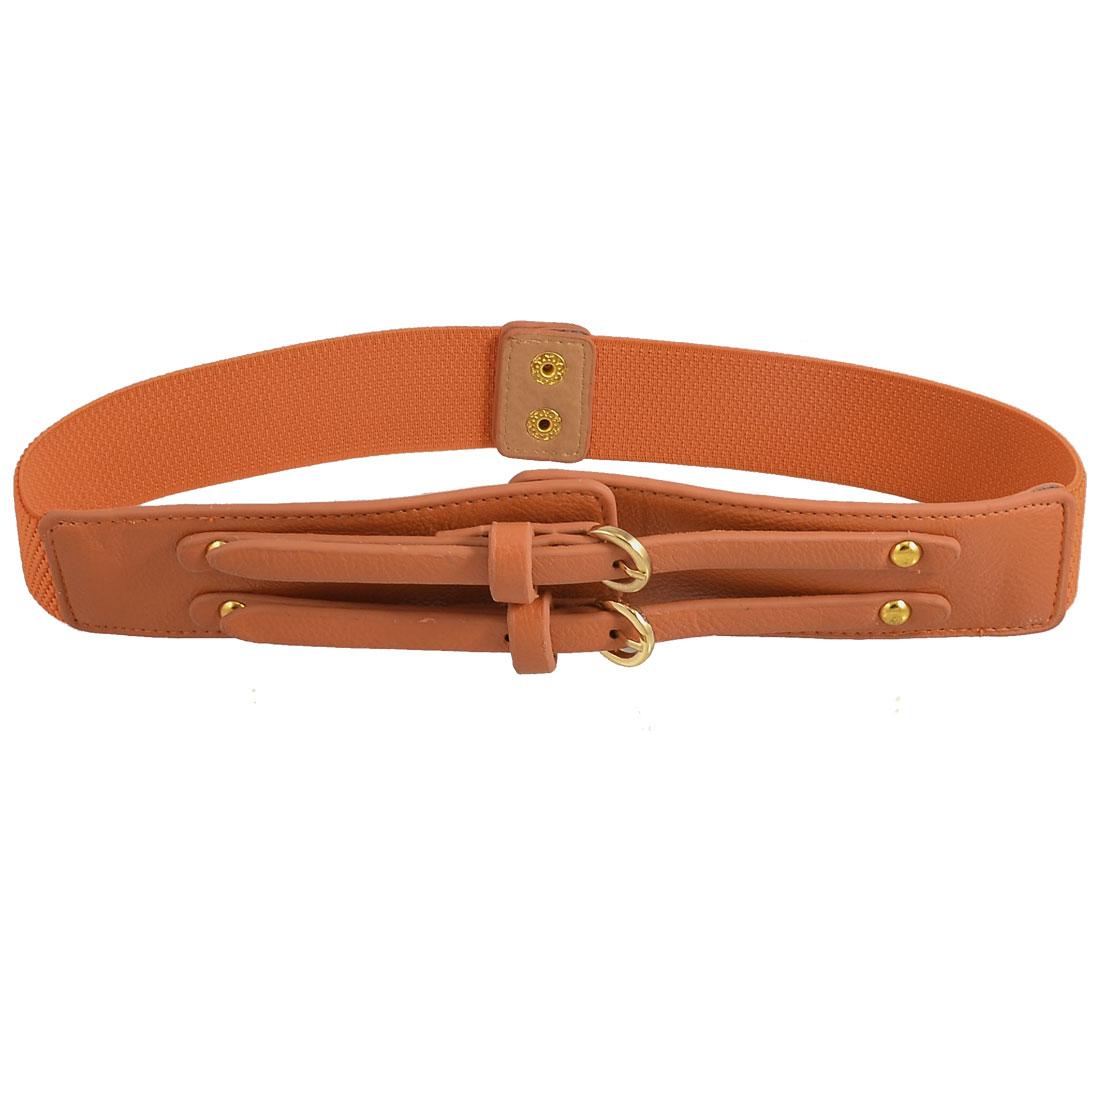 Lady Double Prong Buckle Detailing Press Stud Stretch Waist Belt Orange